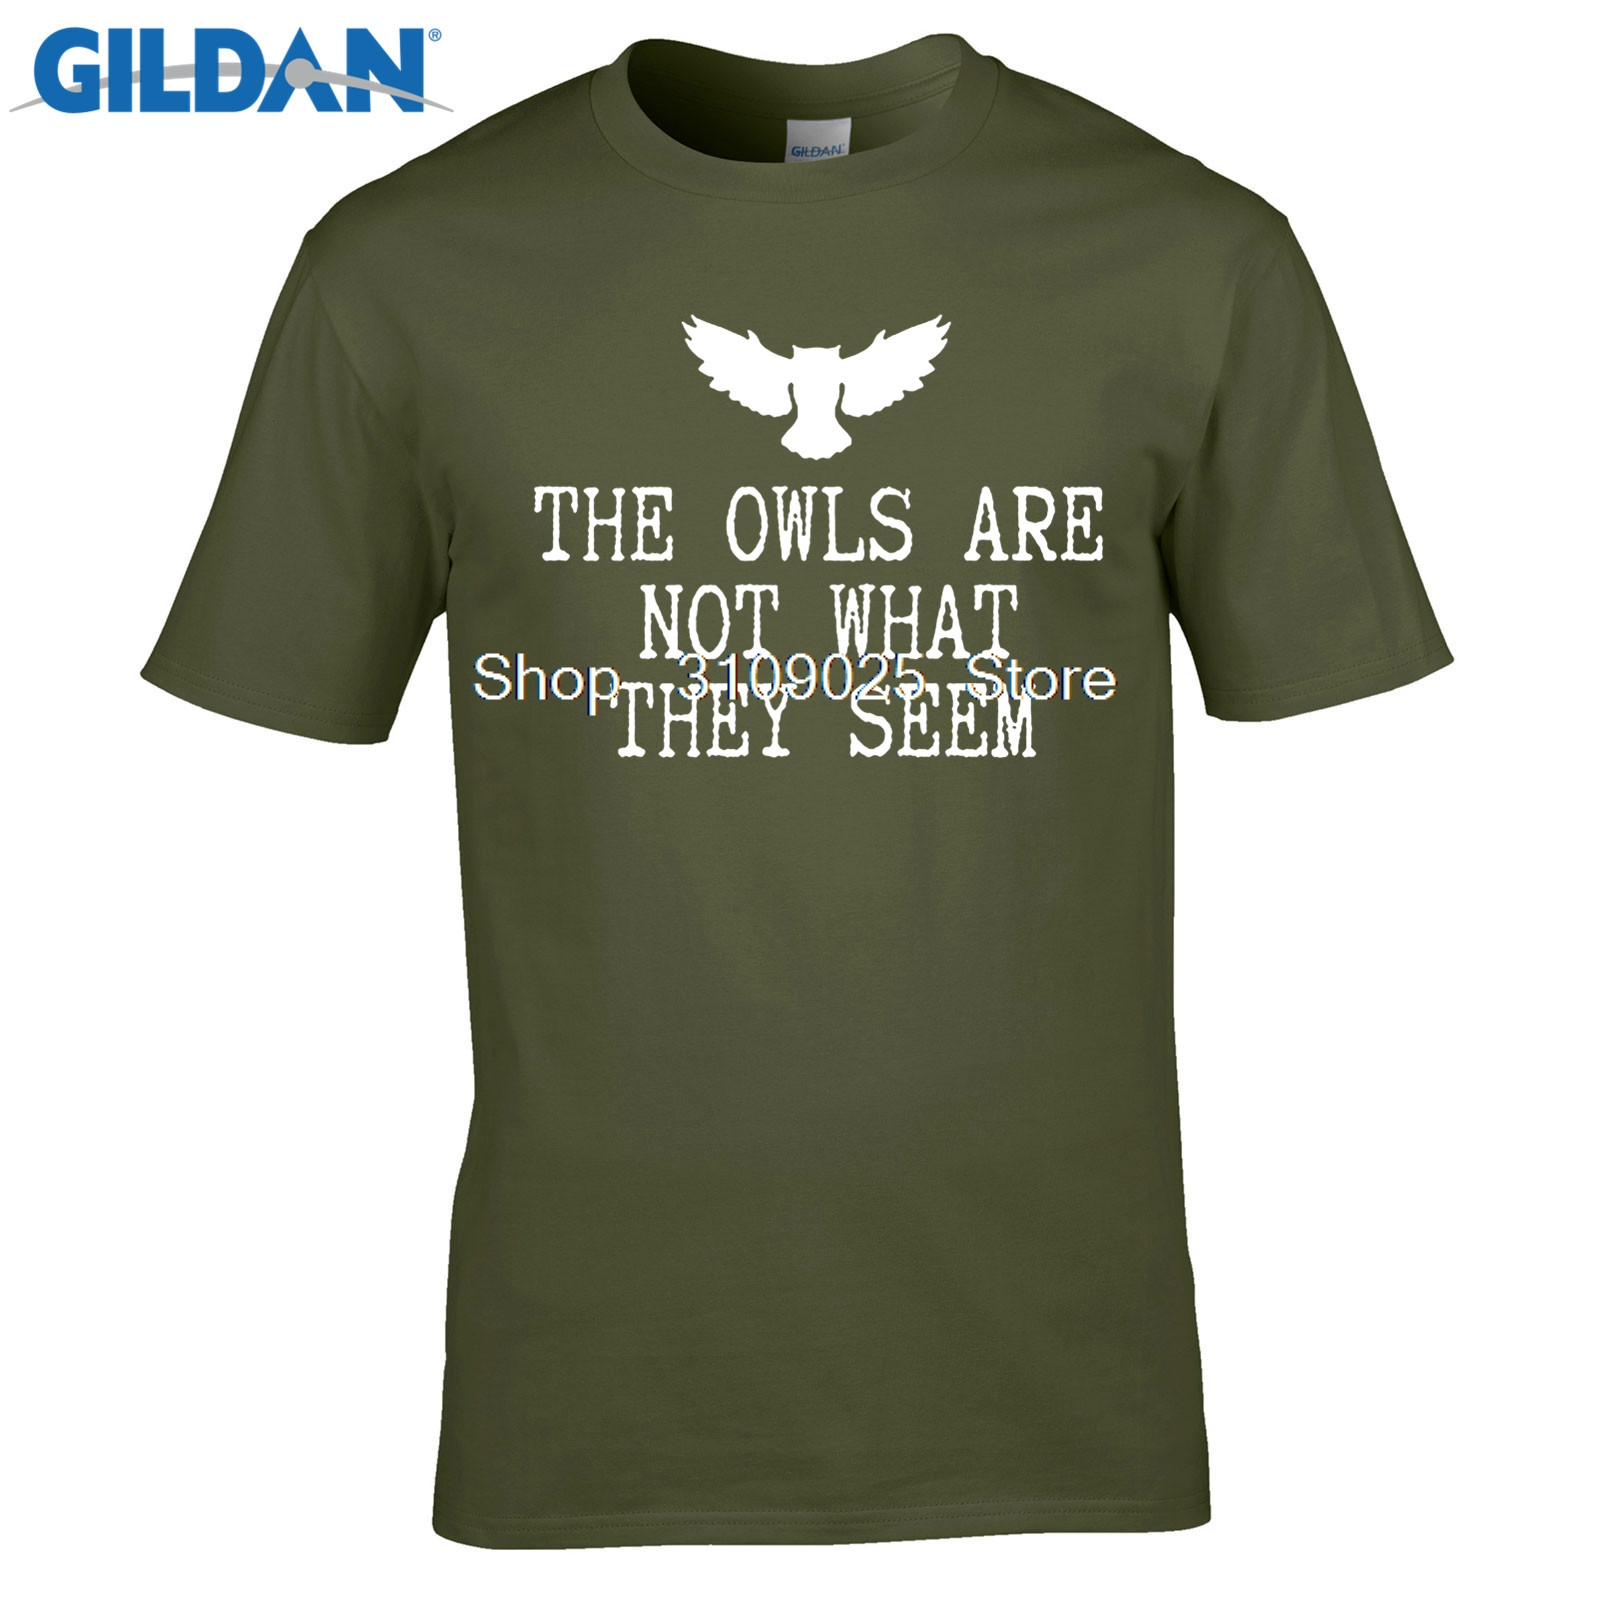 GILDAN men fashion brand t shirt 2017 new arrival Classic Owls Riddle - Twin Peaks - Dark T-Shirt 100% cotton O-Neck T Shirt